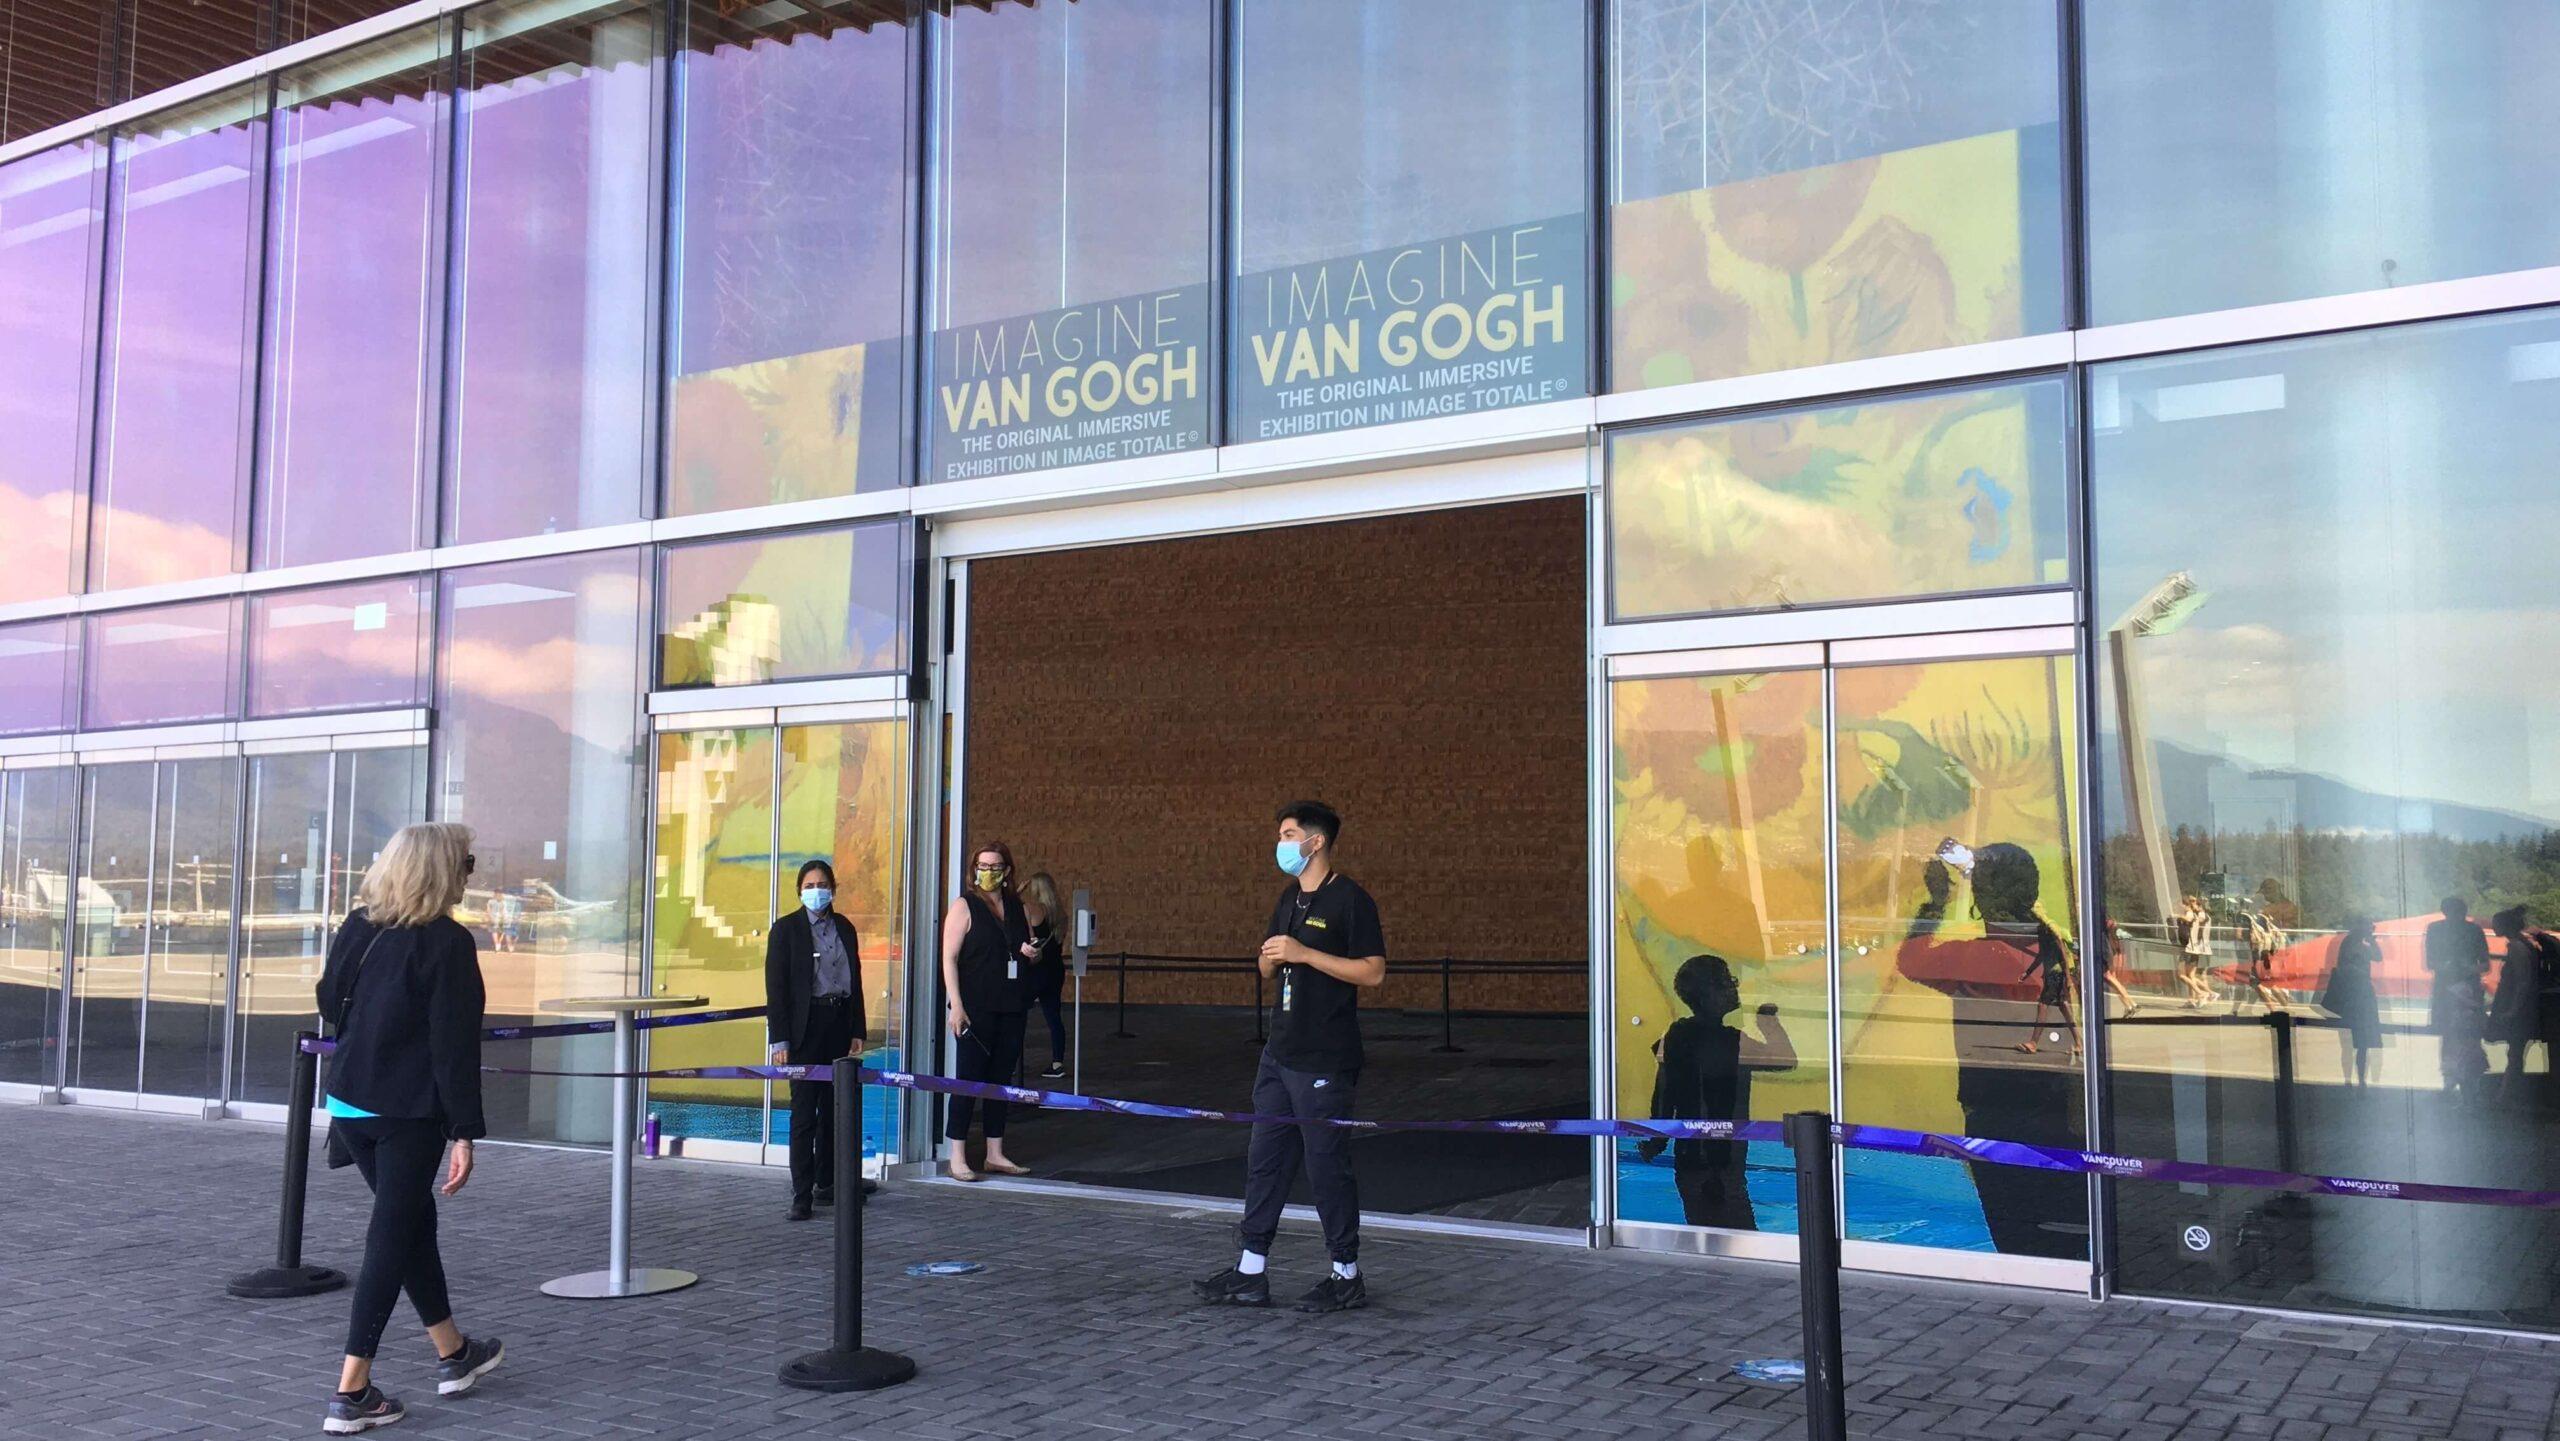 Van & Van Gogh